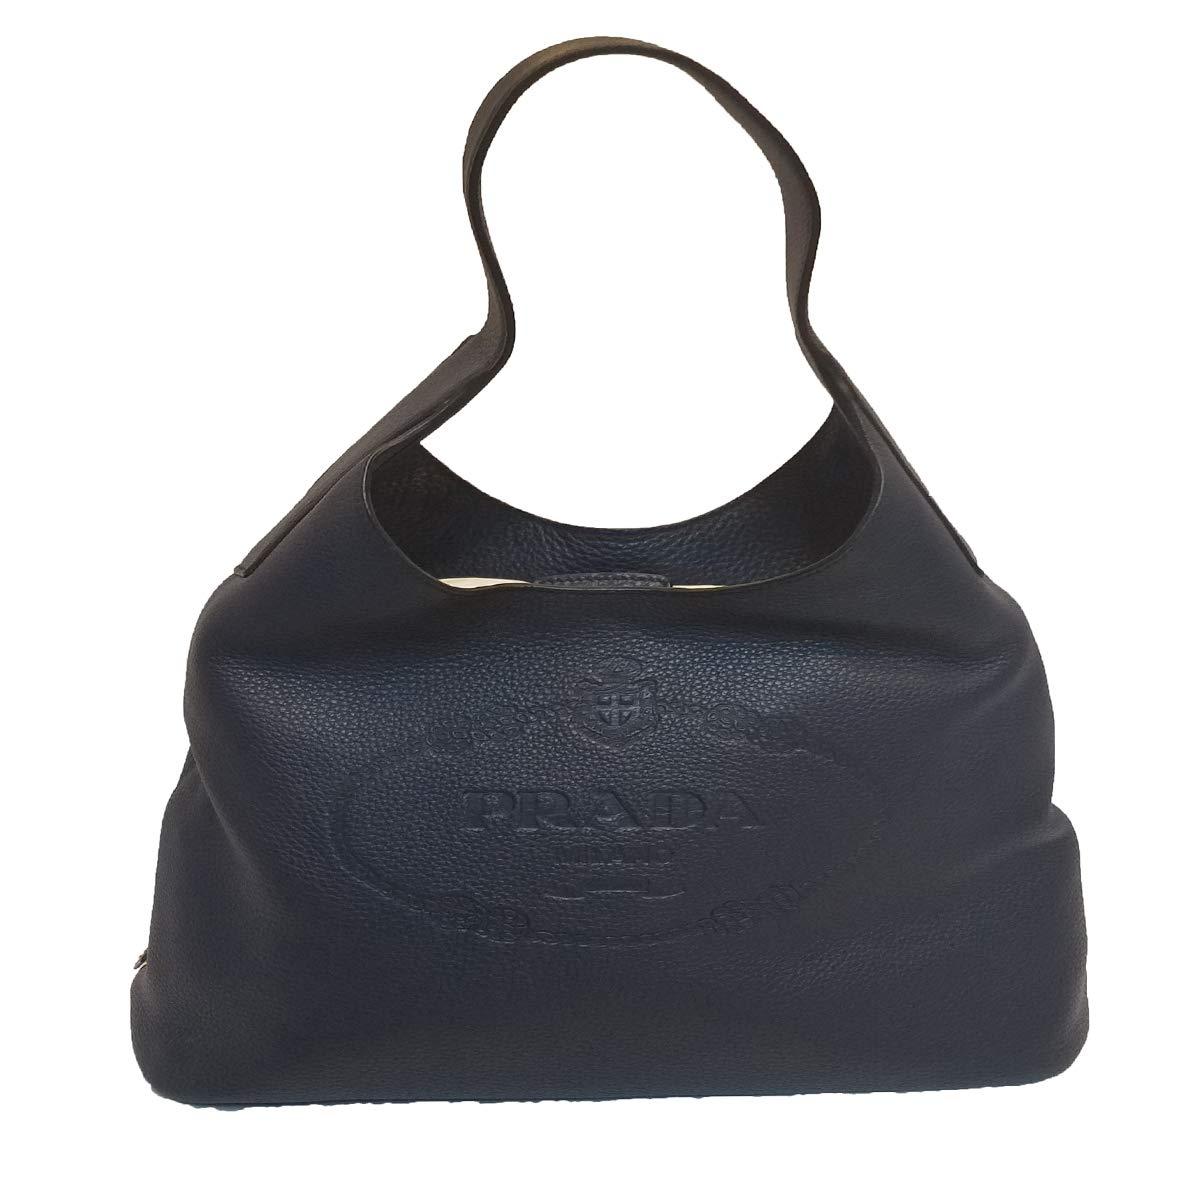 8f7f11b7eb4b Amazon.com: Prada Vitello Daino Navy Blue Hobo Designer Handbag for Women  1BC026: Shoes